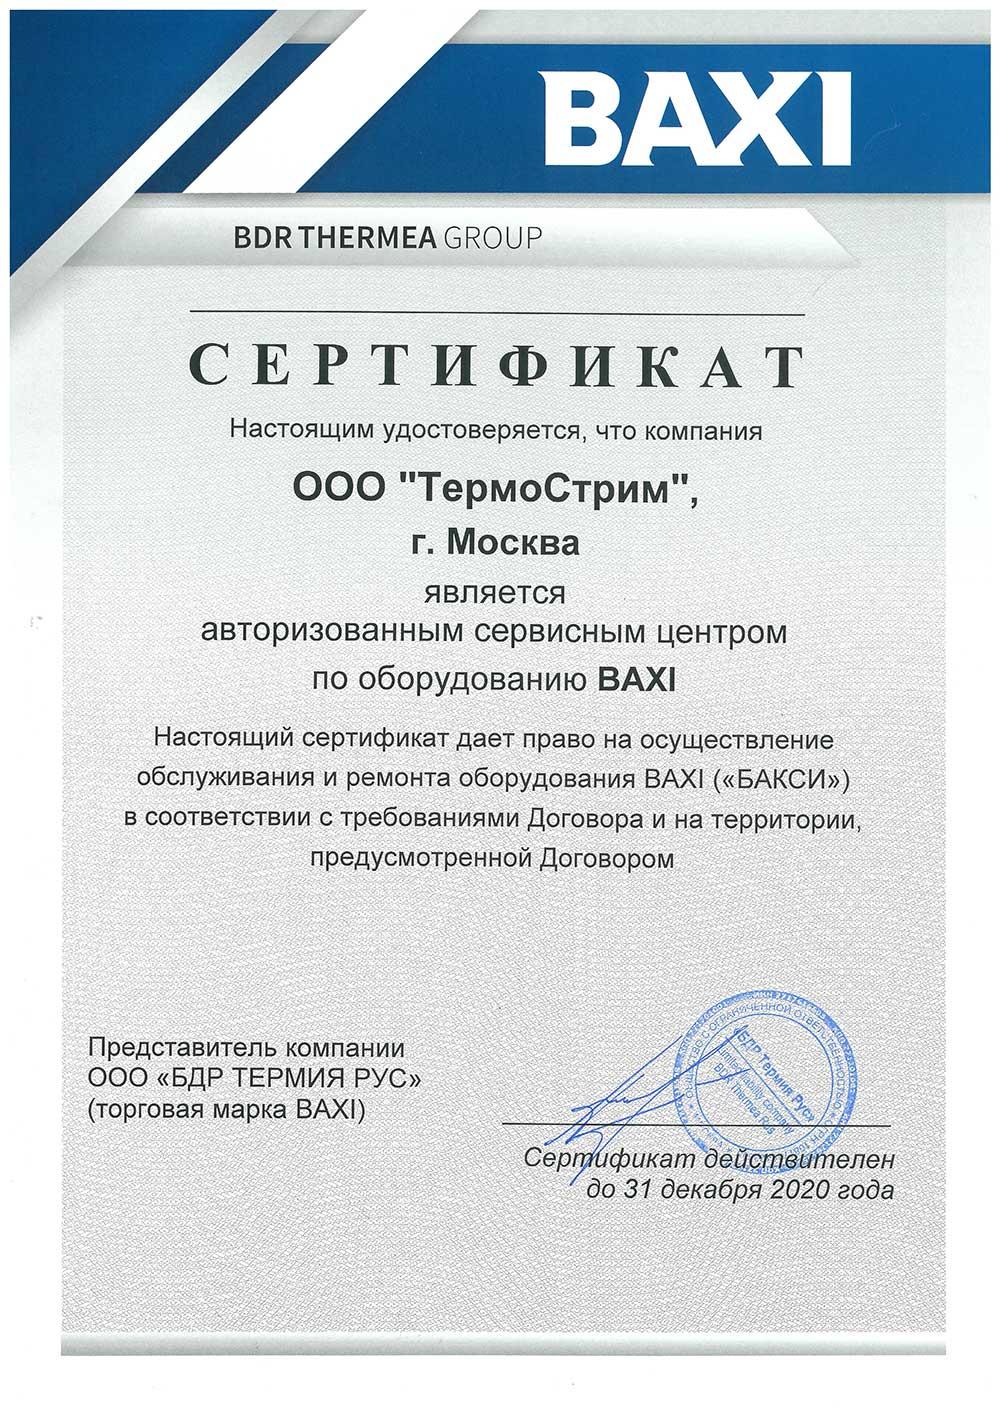 Сертификат авторизованного сервисного центра Baxi